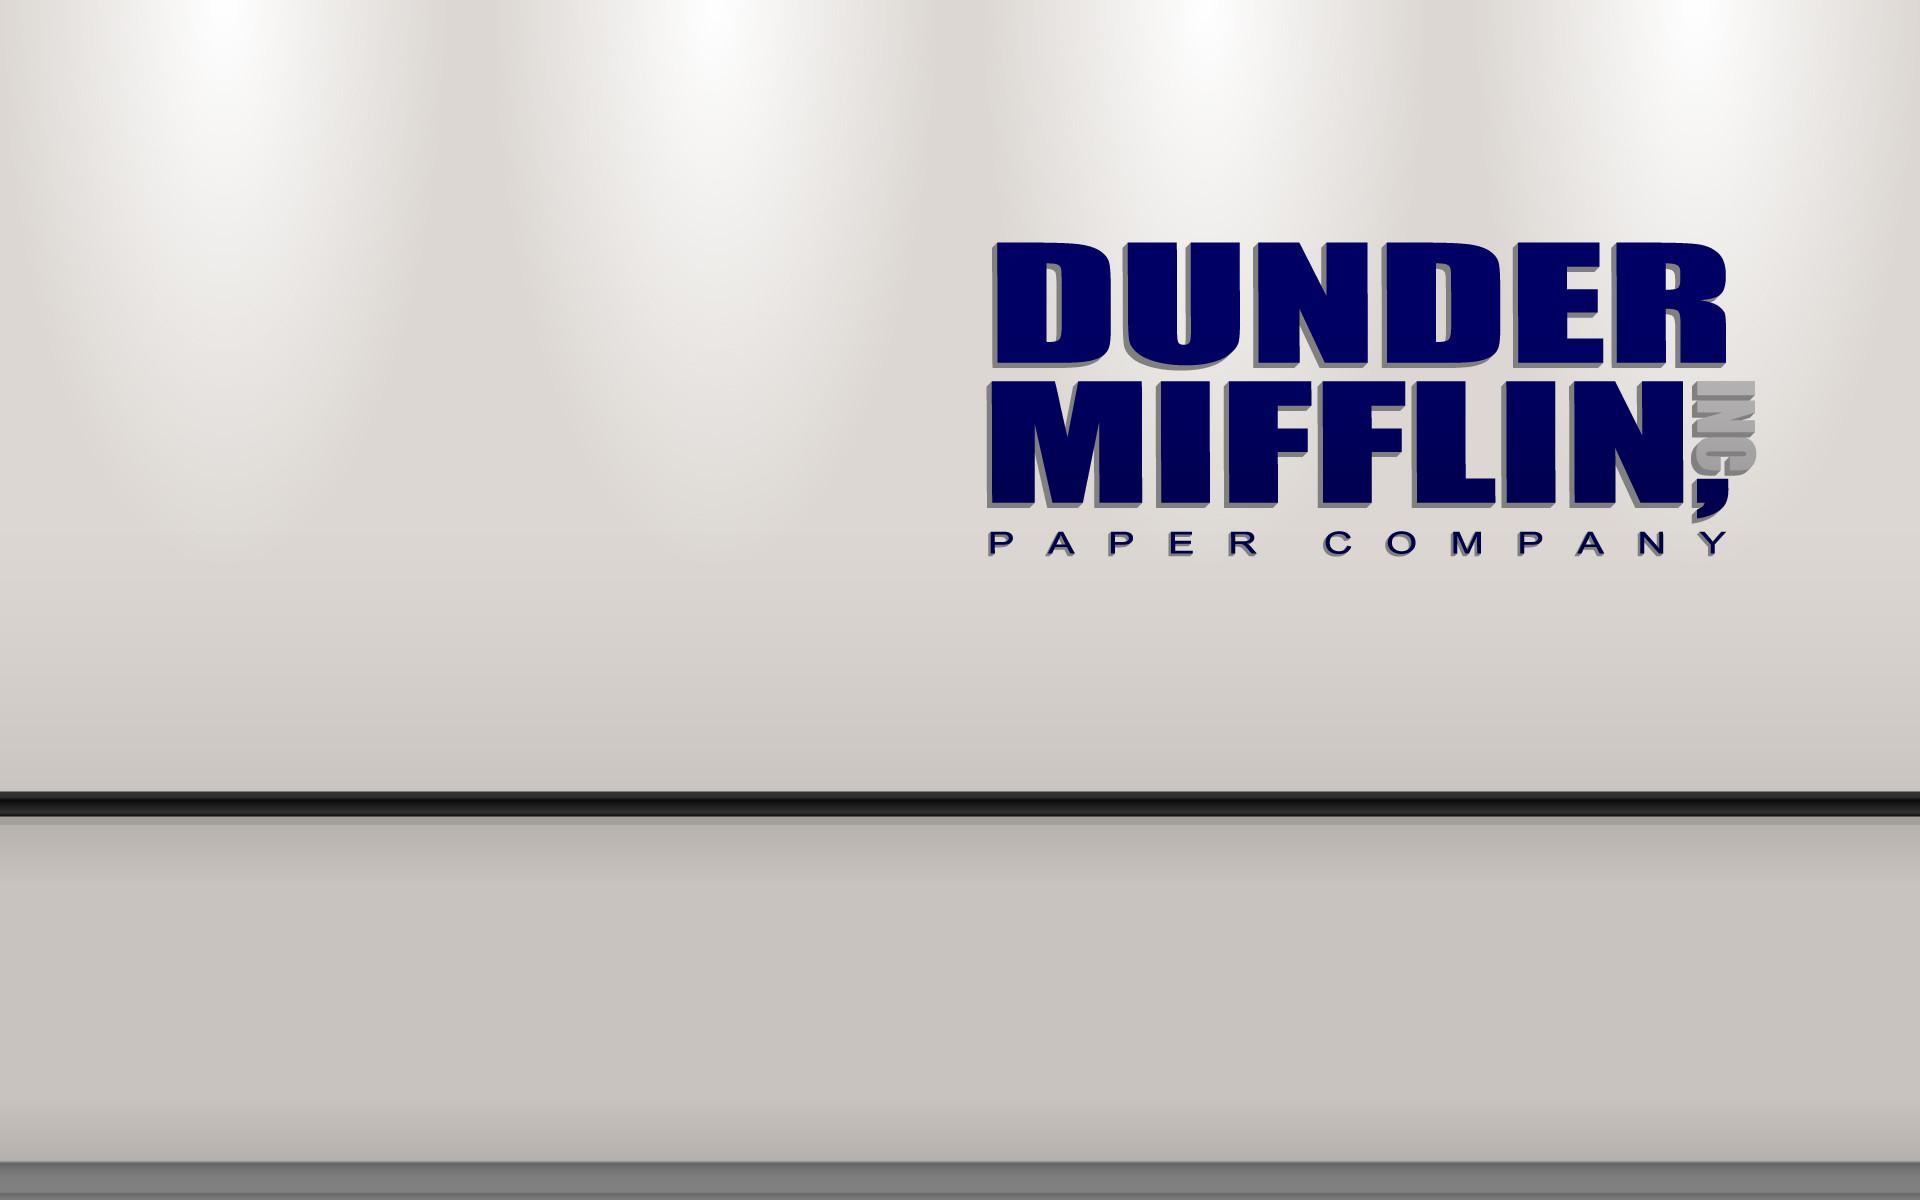 Dunder Mifflin Logo wallpaper – 1159949